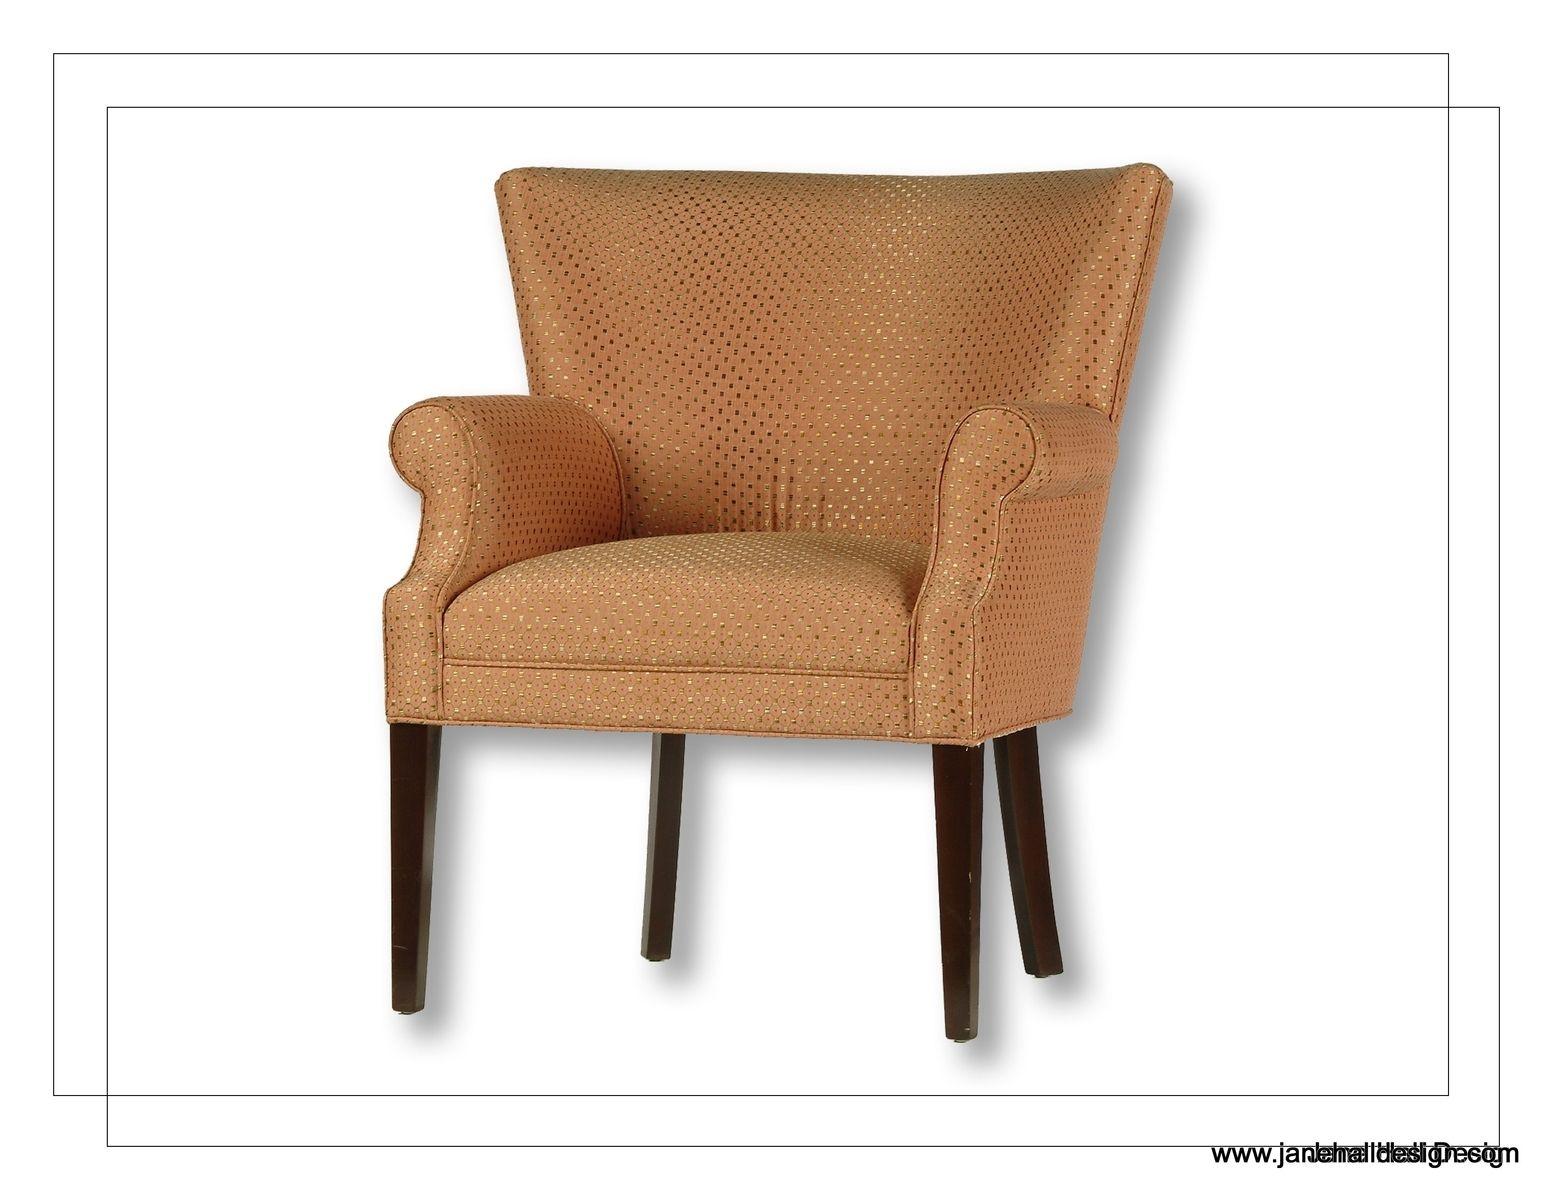 Custom made upholstered chair custom made arm chair